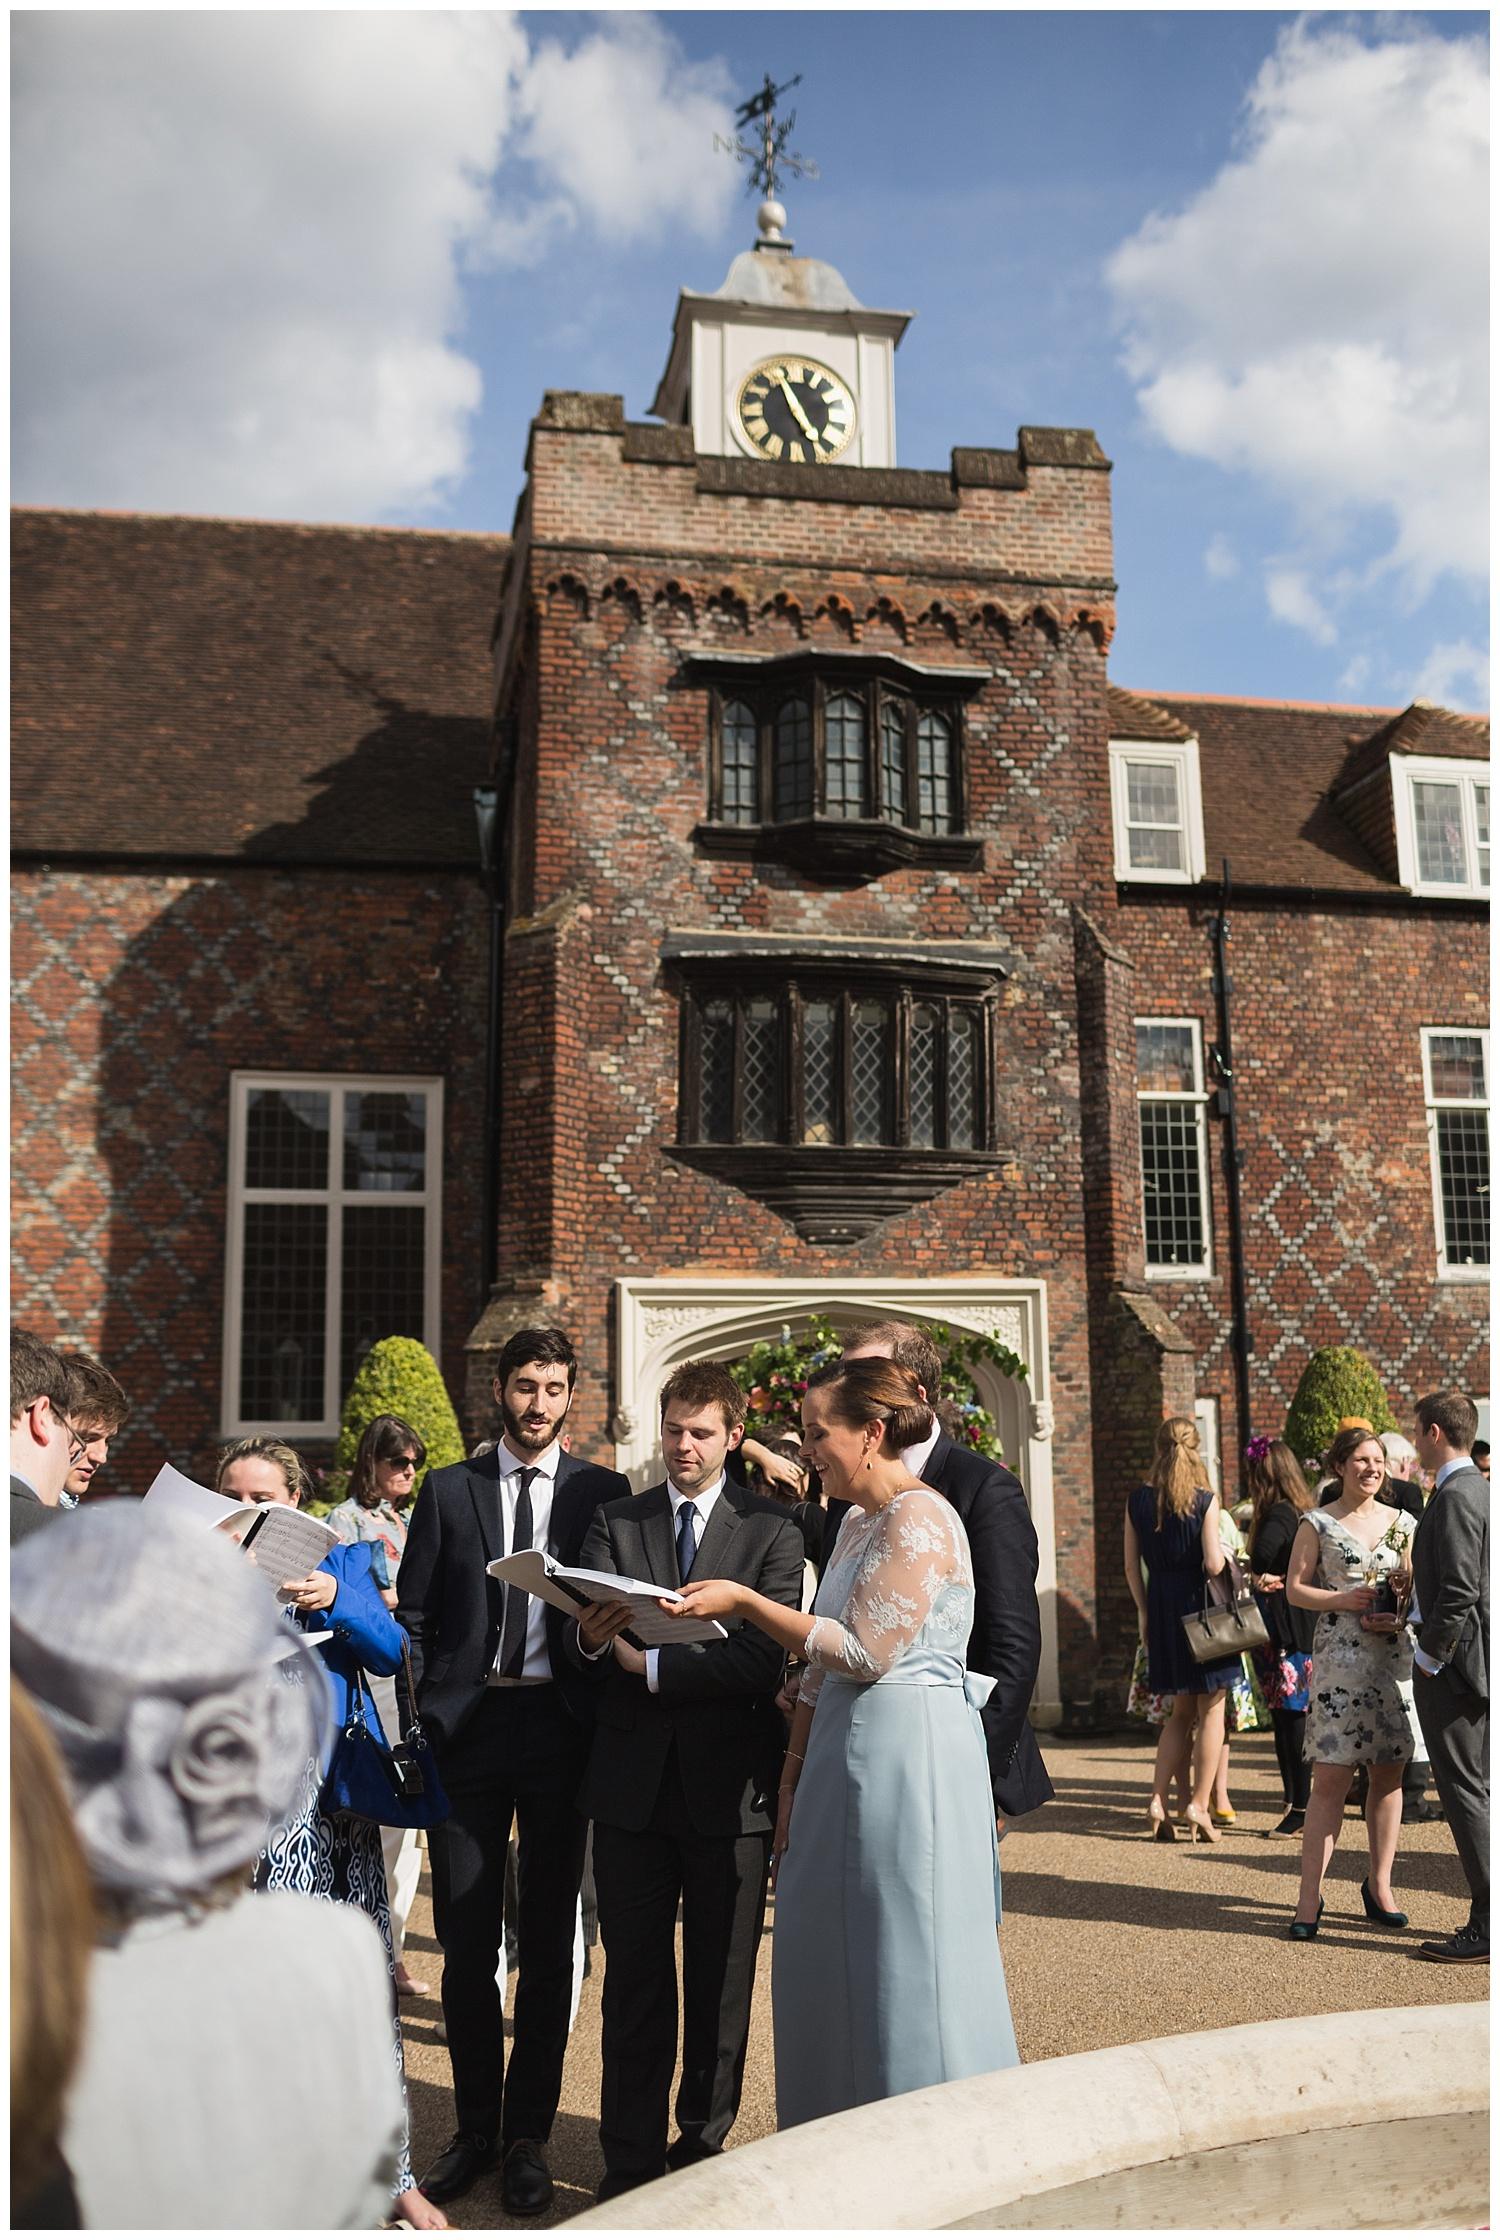 fulham-palace-wedding-reception.jpg